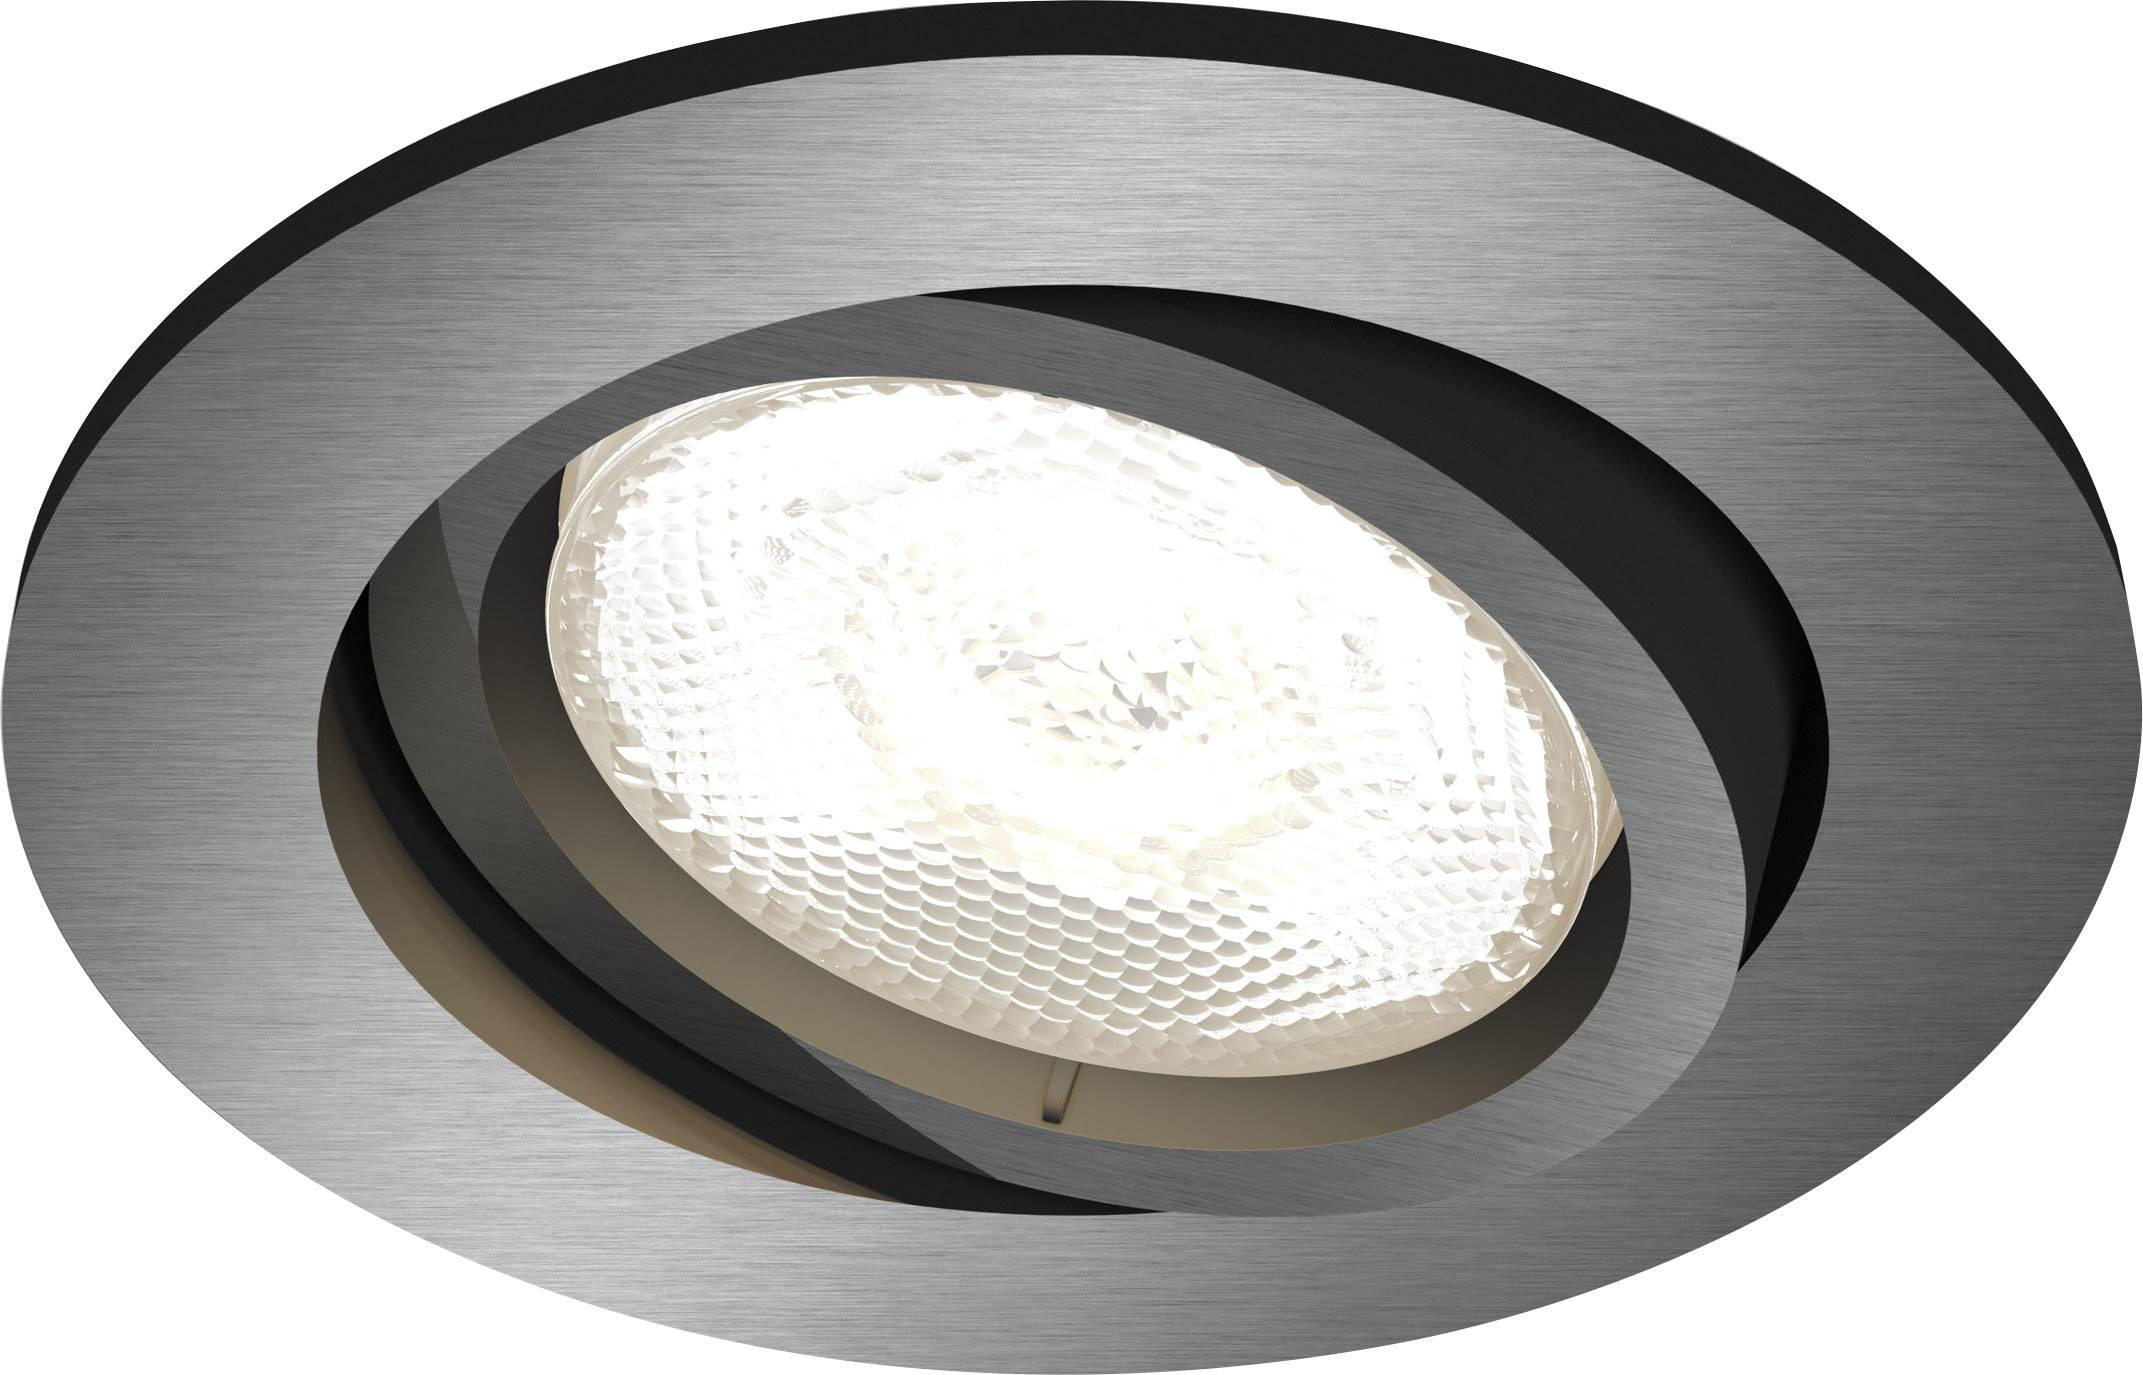 Spot Led Encastrable Led Intégrée Philips Lighting Shellbark 5020199p0 Blanc Chaud 4 5 W Anthracite